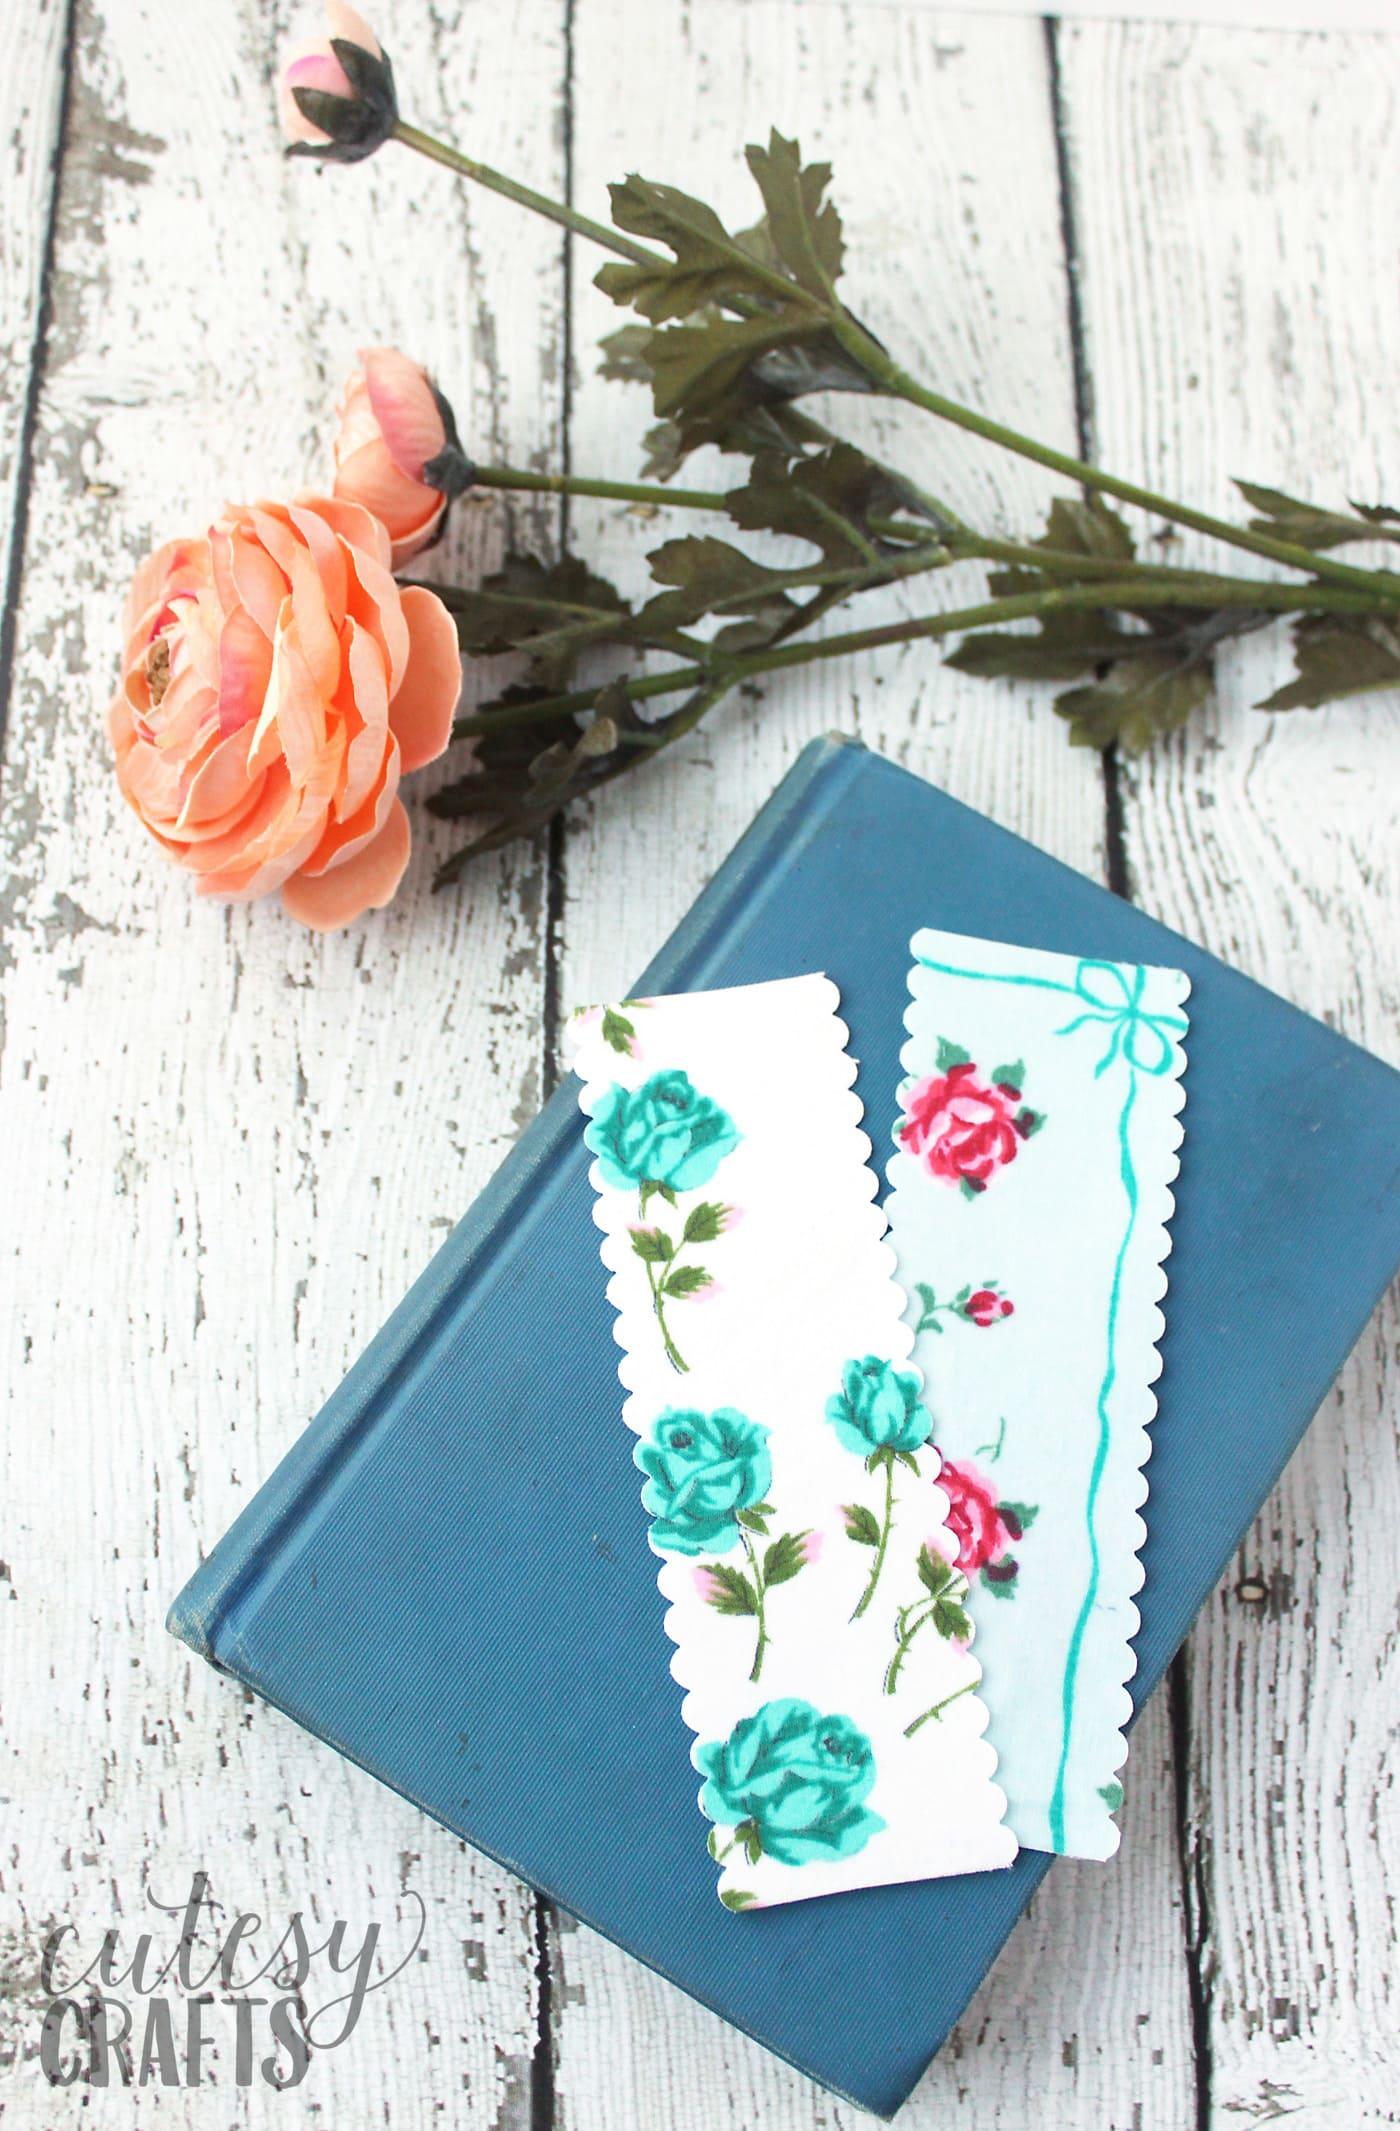 DIY Handmade Bookmarks Using Vintage Linens  The Polka